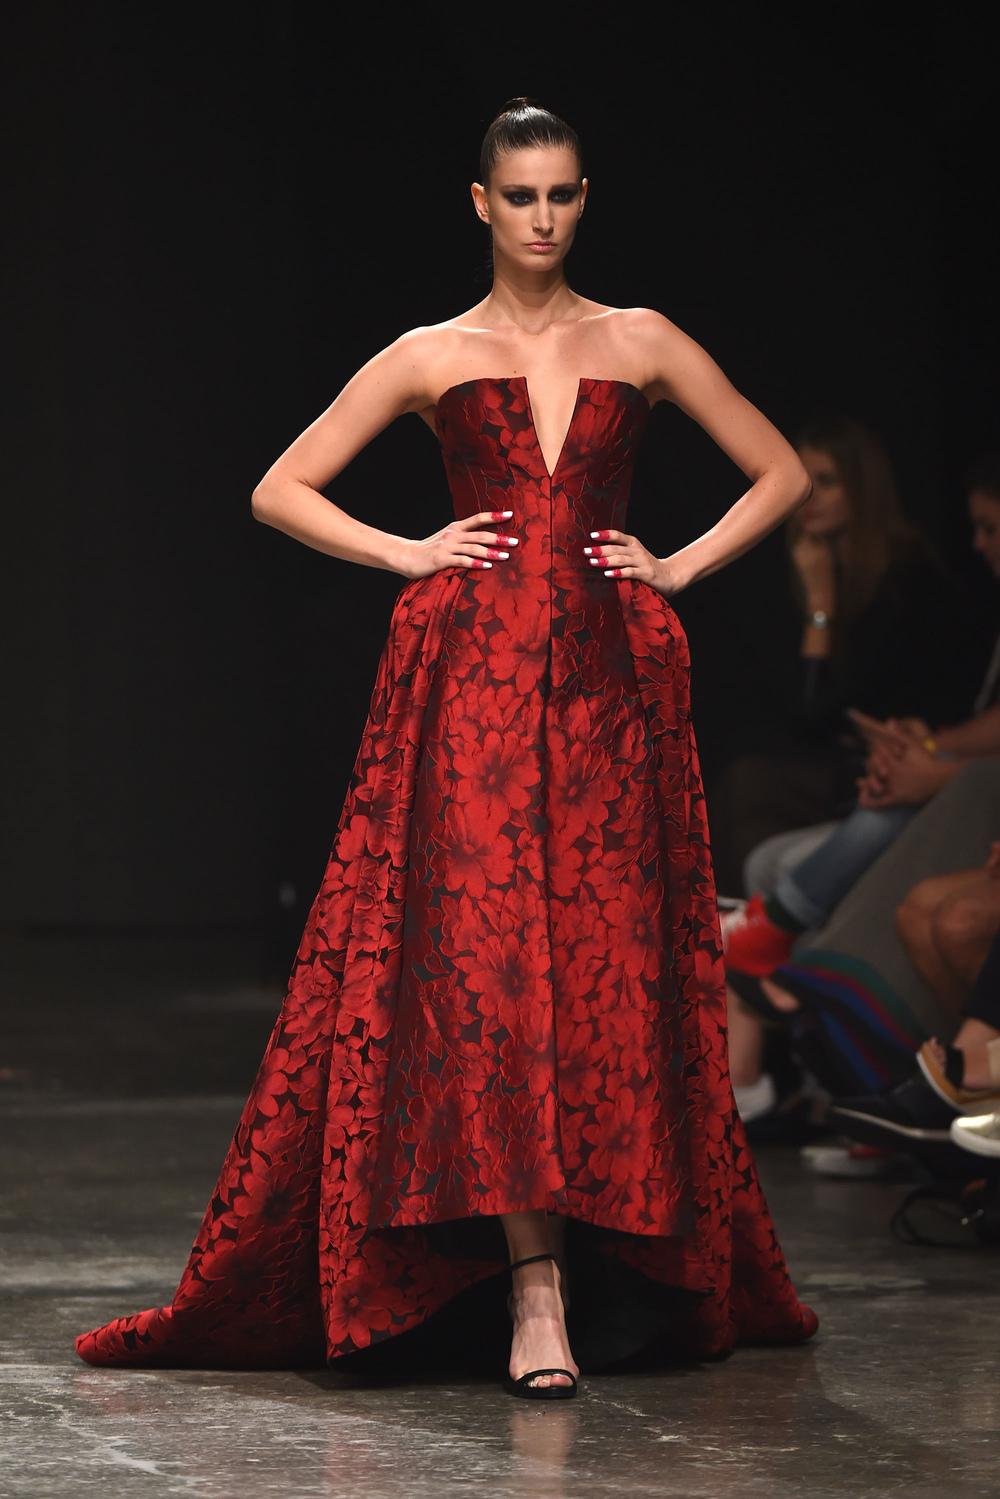 Jean Louis Sabaji at Fashion Forward Season 5. ubai, United Arab Emirates